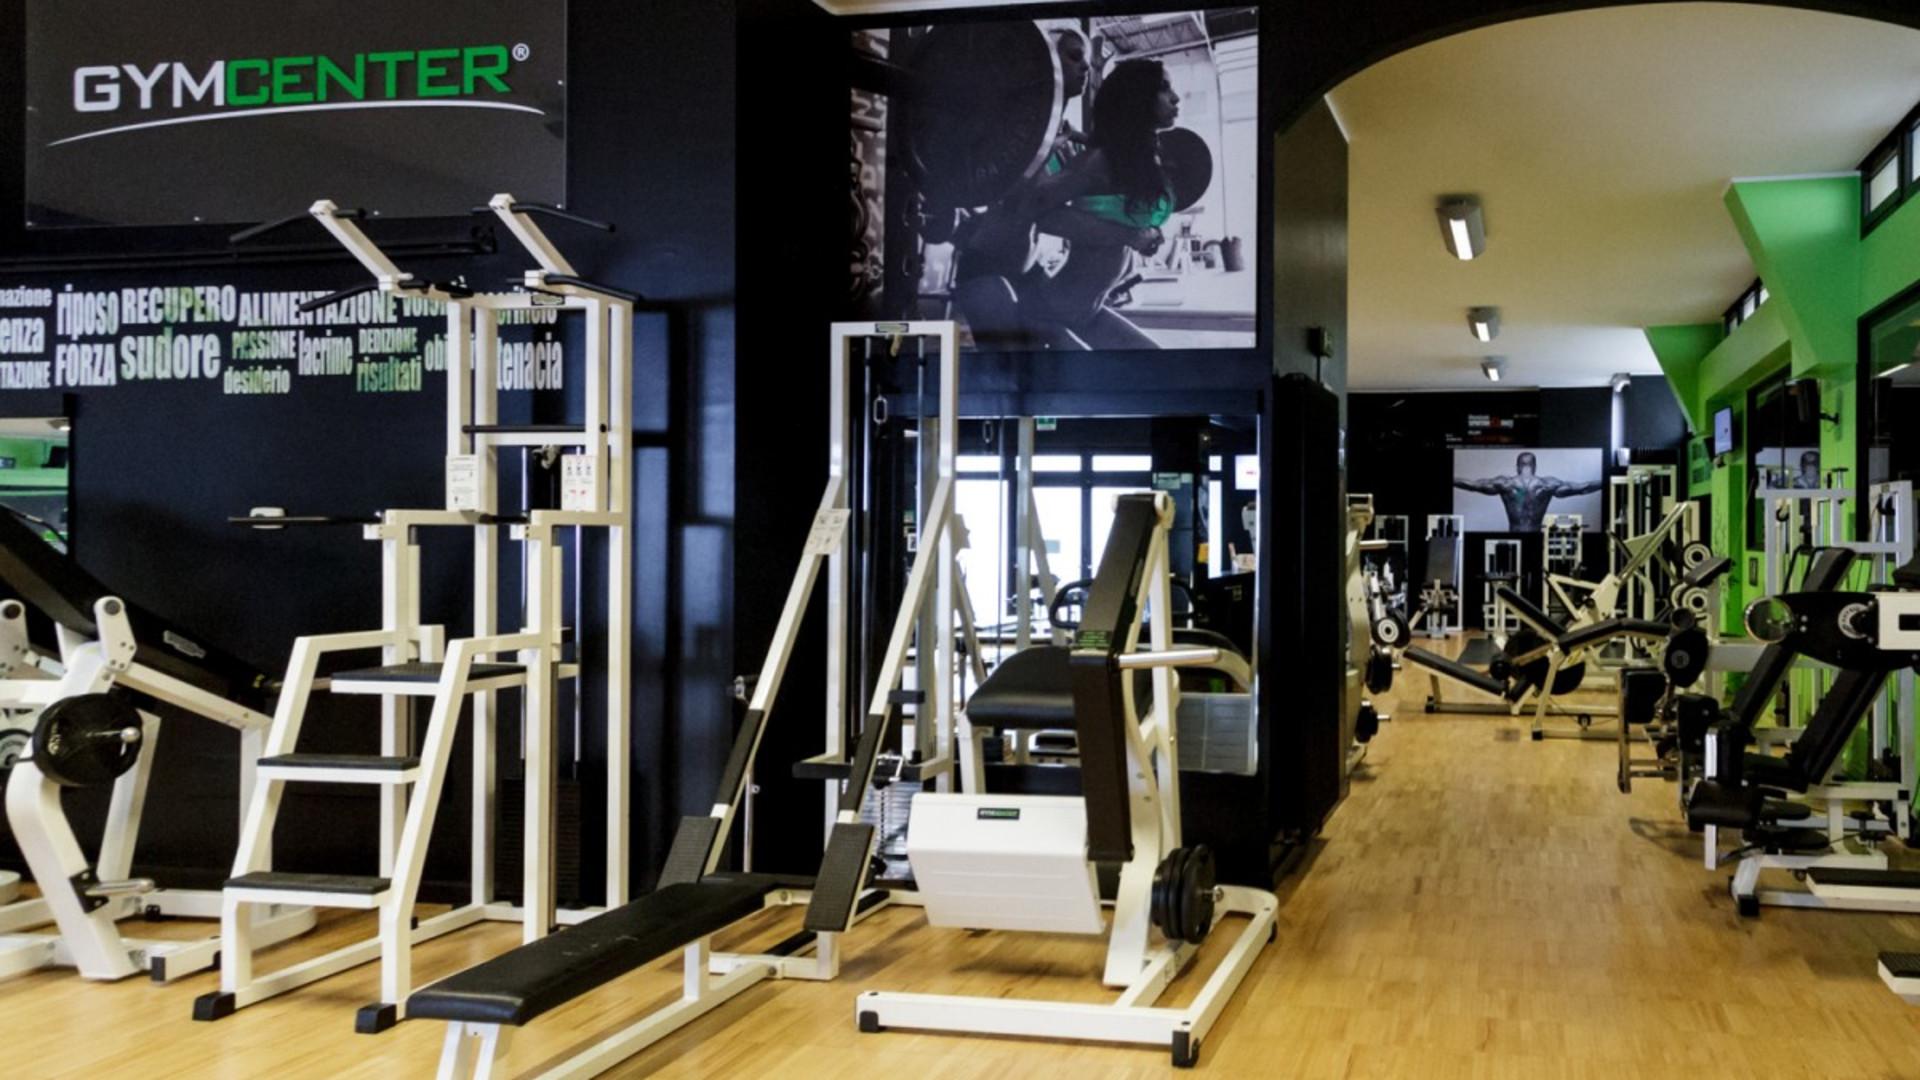 Gym Center prezzi